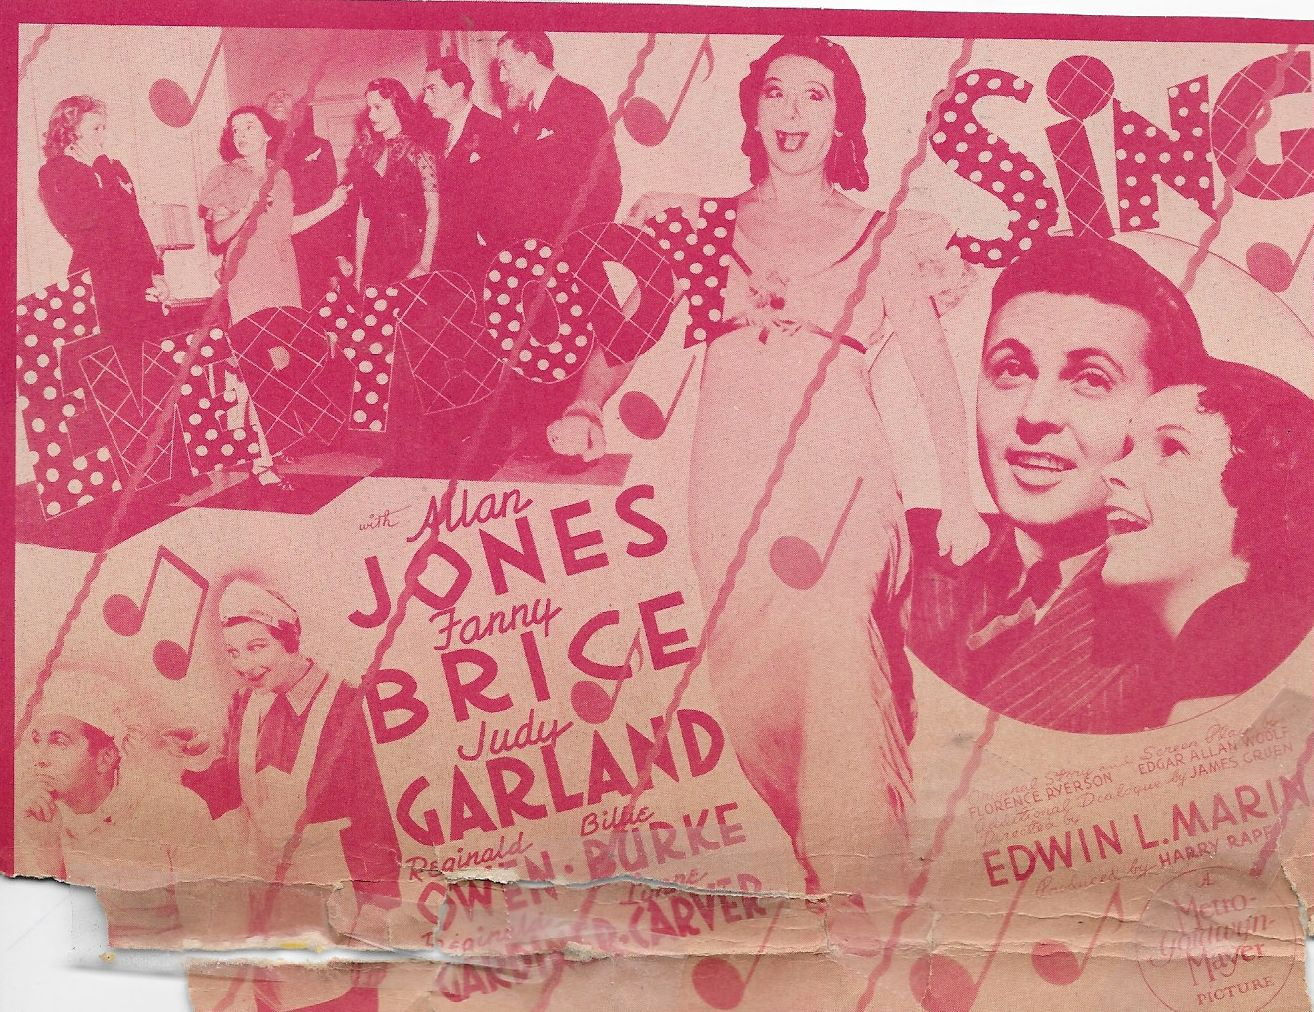 Judy Garland, Billie Burke, Fanny Brice, Lynne Carver, Allan Jones, Adia Kuznetzoff, and Reginald Owen in Everybody Sing (1938)